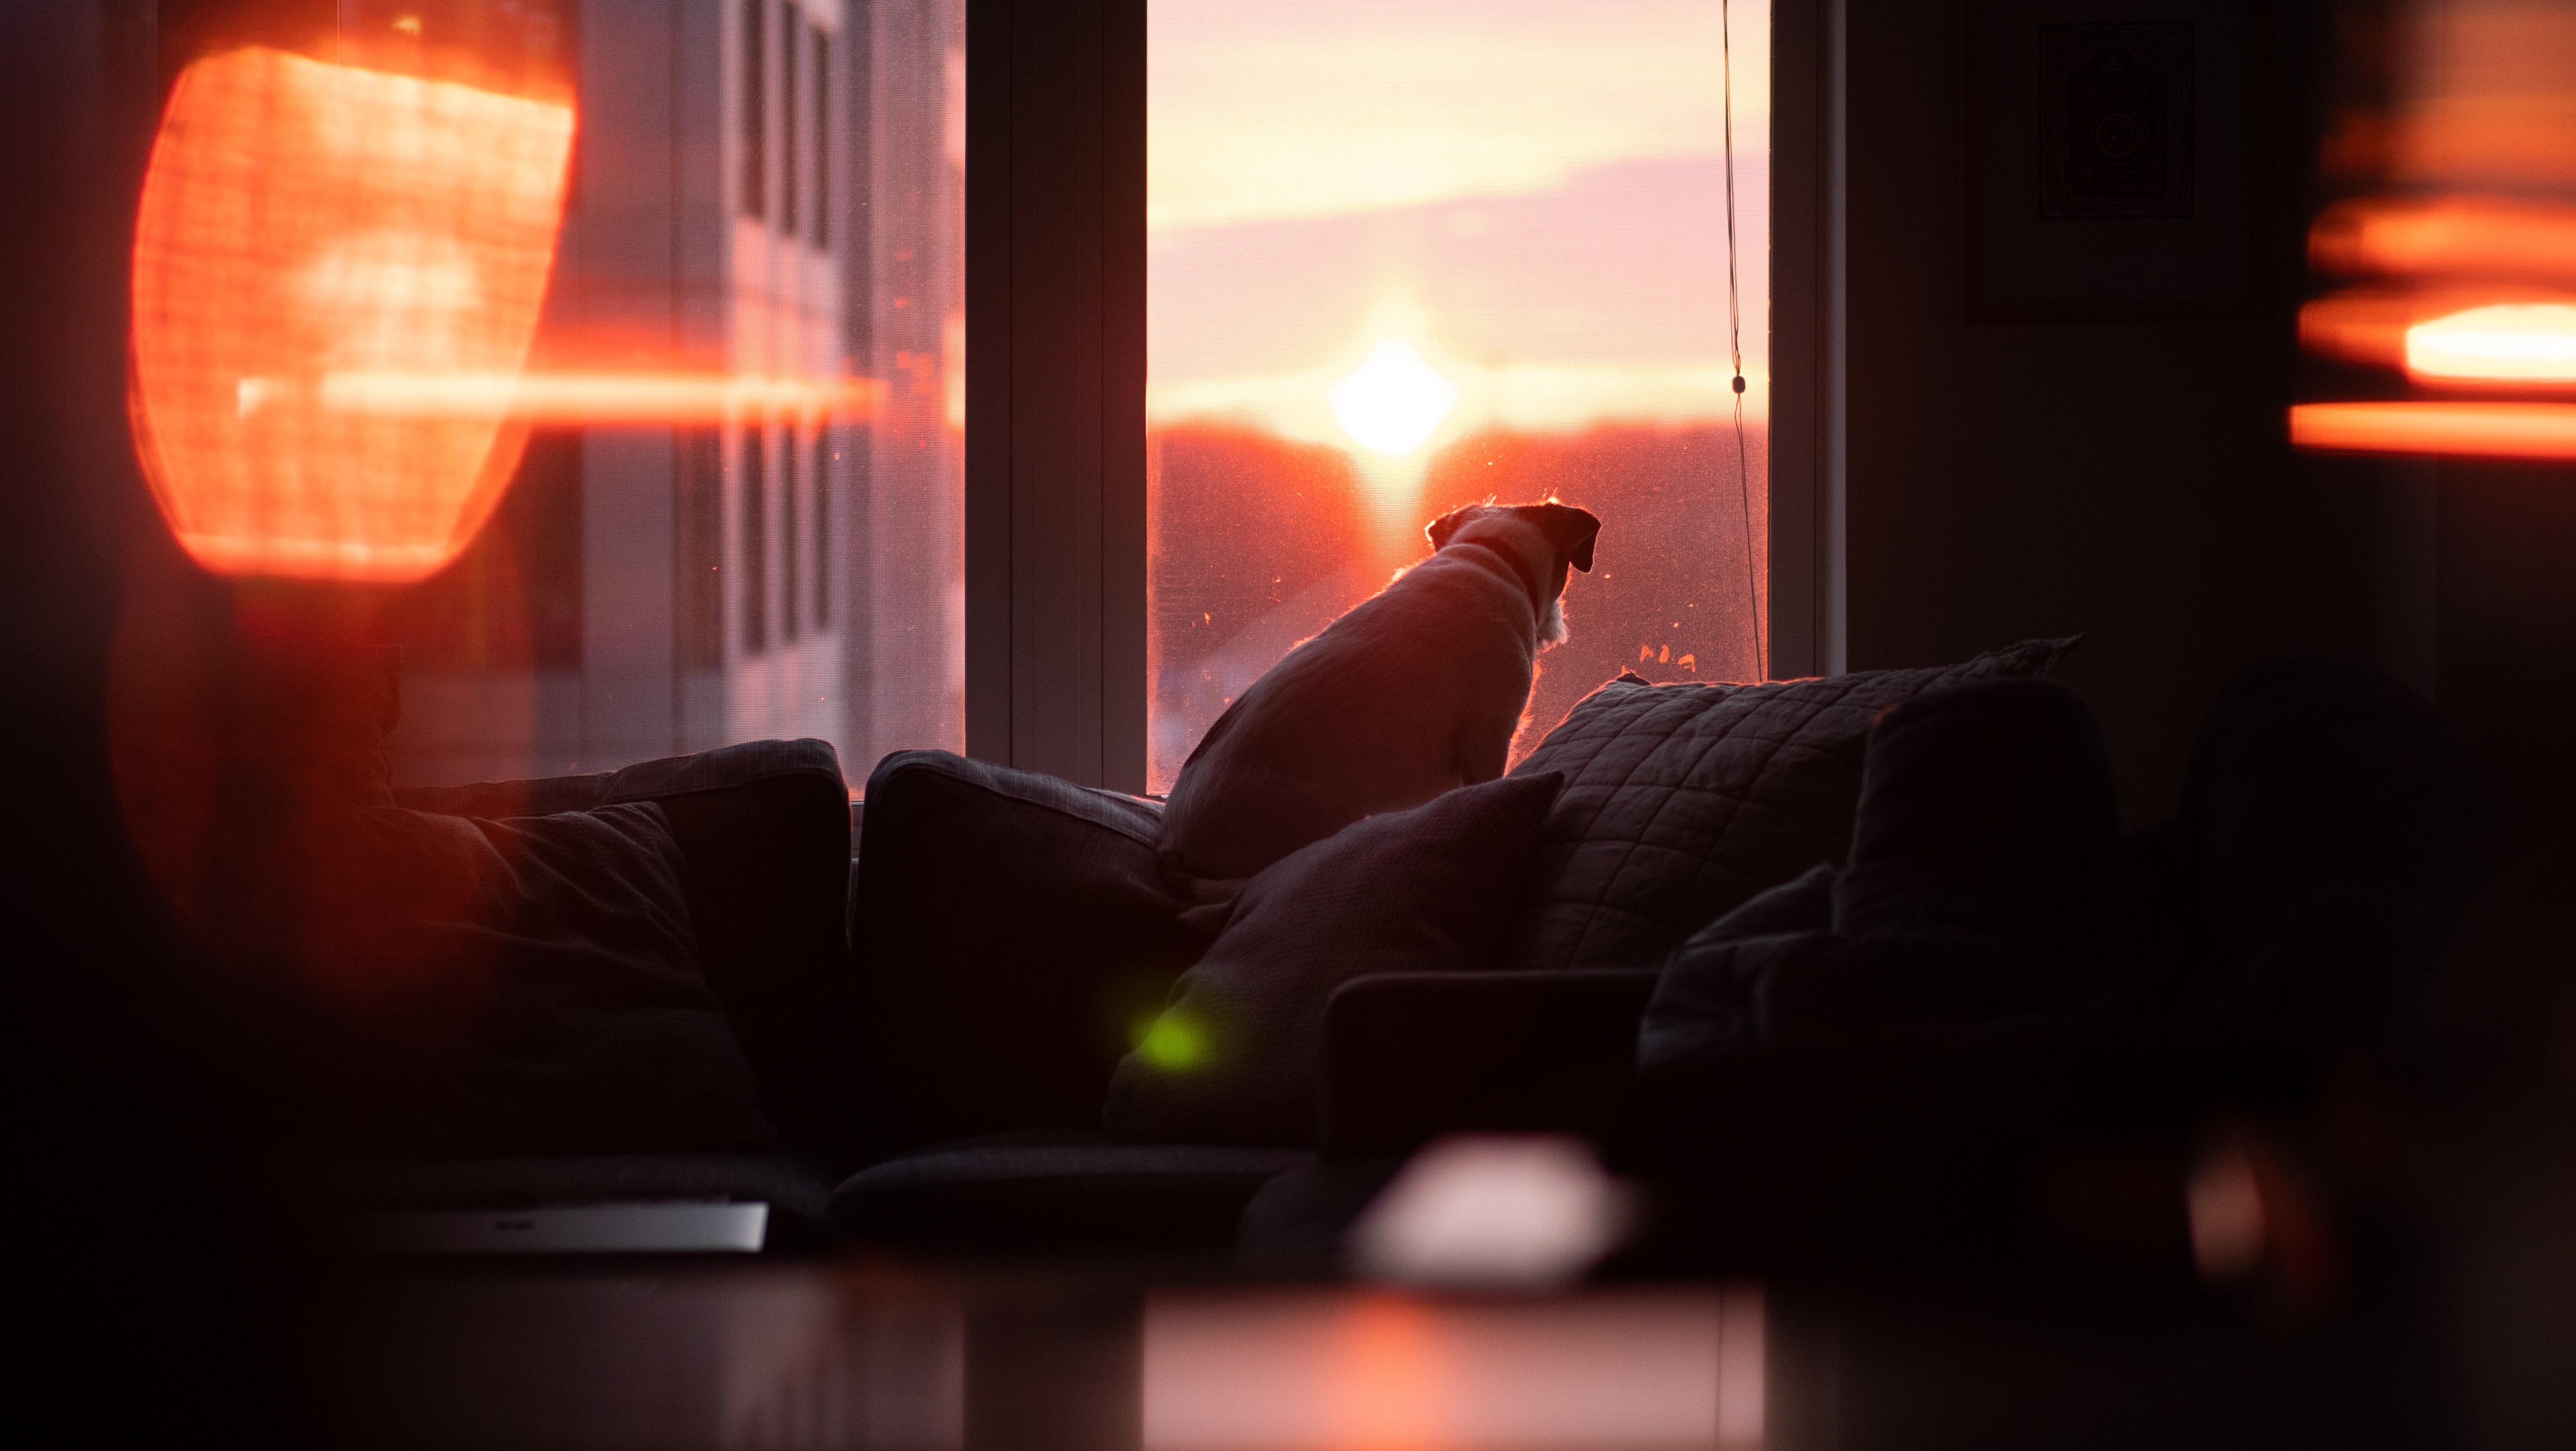 dog watching sunset 4k 1616093496 - Dog Watching Sunset 4k - Dog Watching Sunset 4k wallpapers